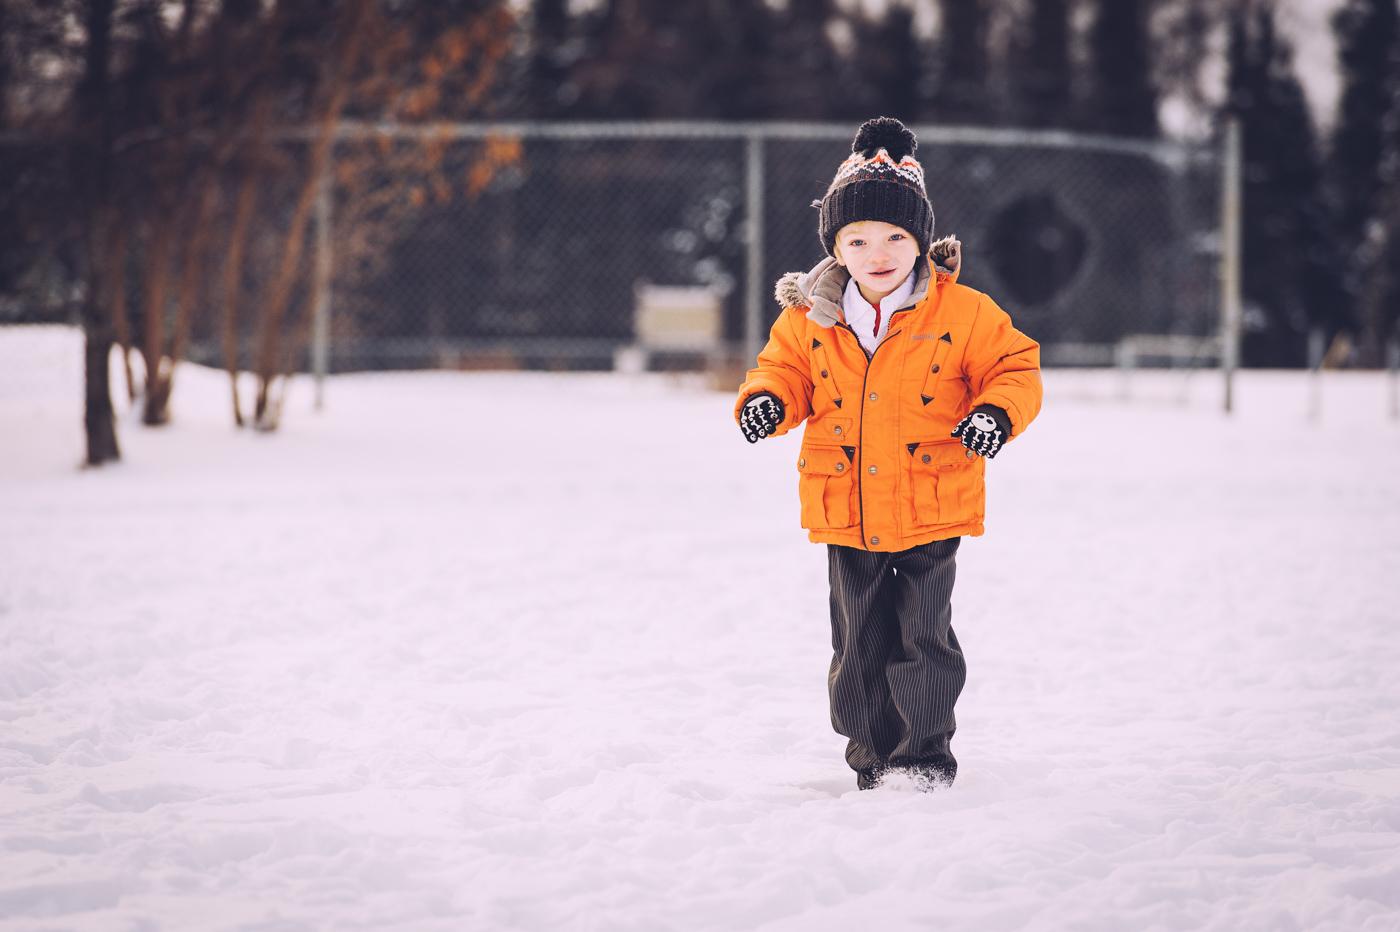 tyra_jaime_hayden_portraits_blog5.jpg